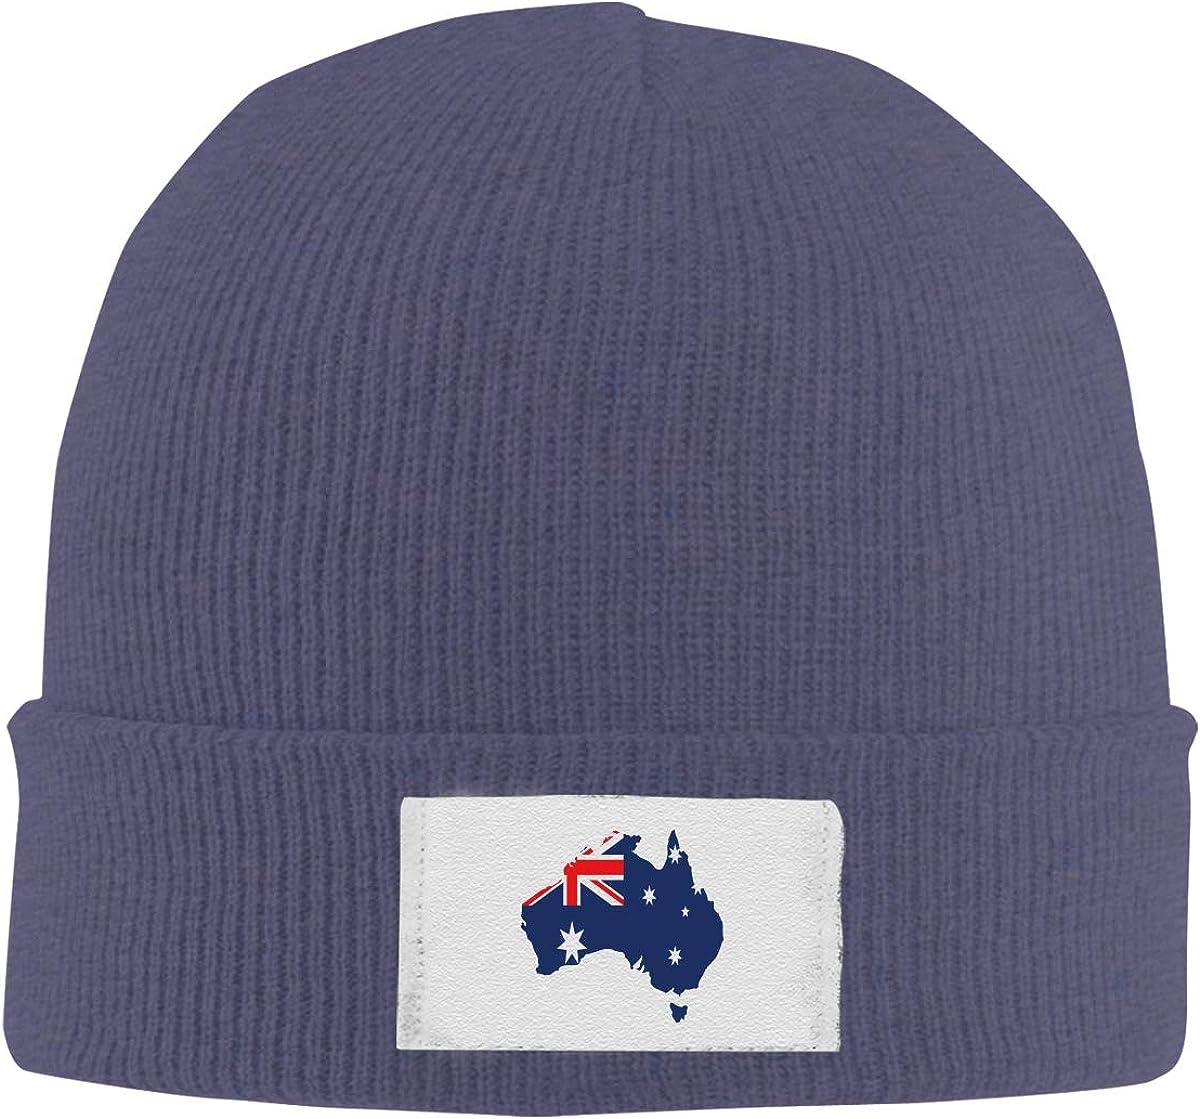 Stretchy Cuff Beanie Hat Black Dunpaiaa Skull Caps Rhinoceros Winter Warm Knit Hats